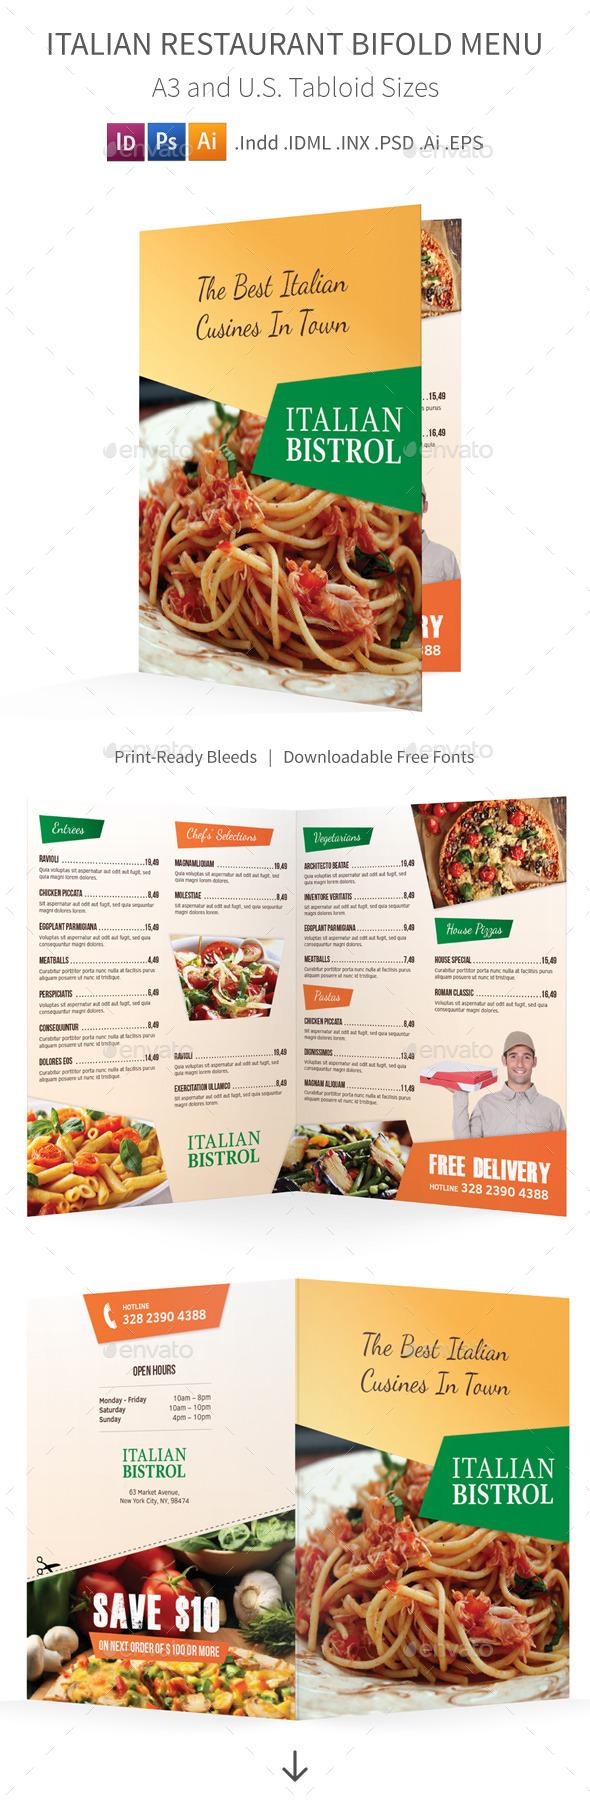 GraphicRiver Italian Restaurant Bifold Halffold Menu 10833358